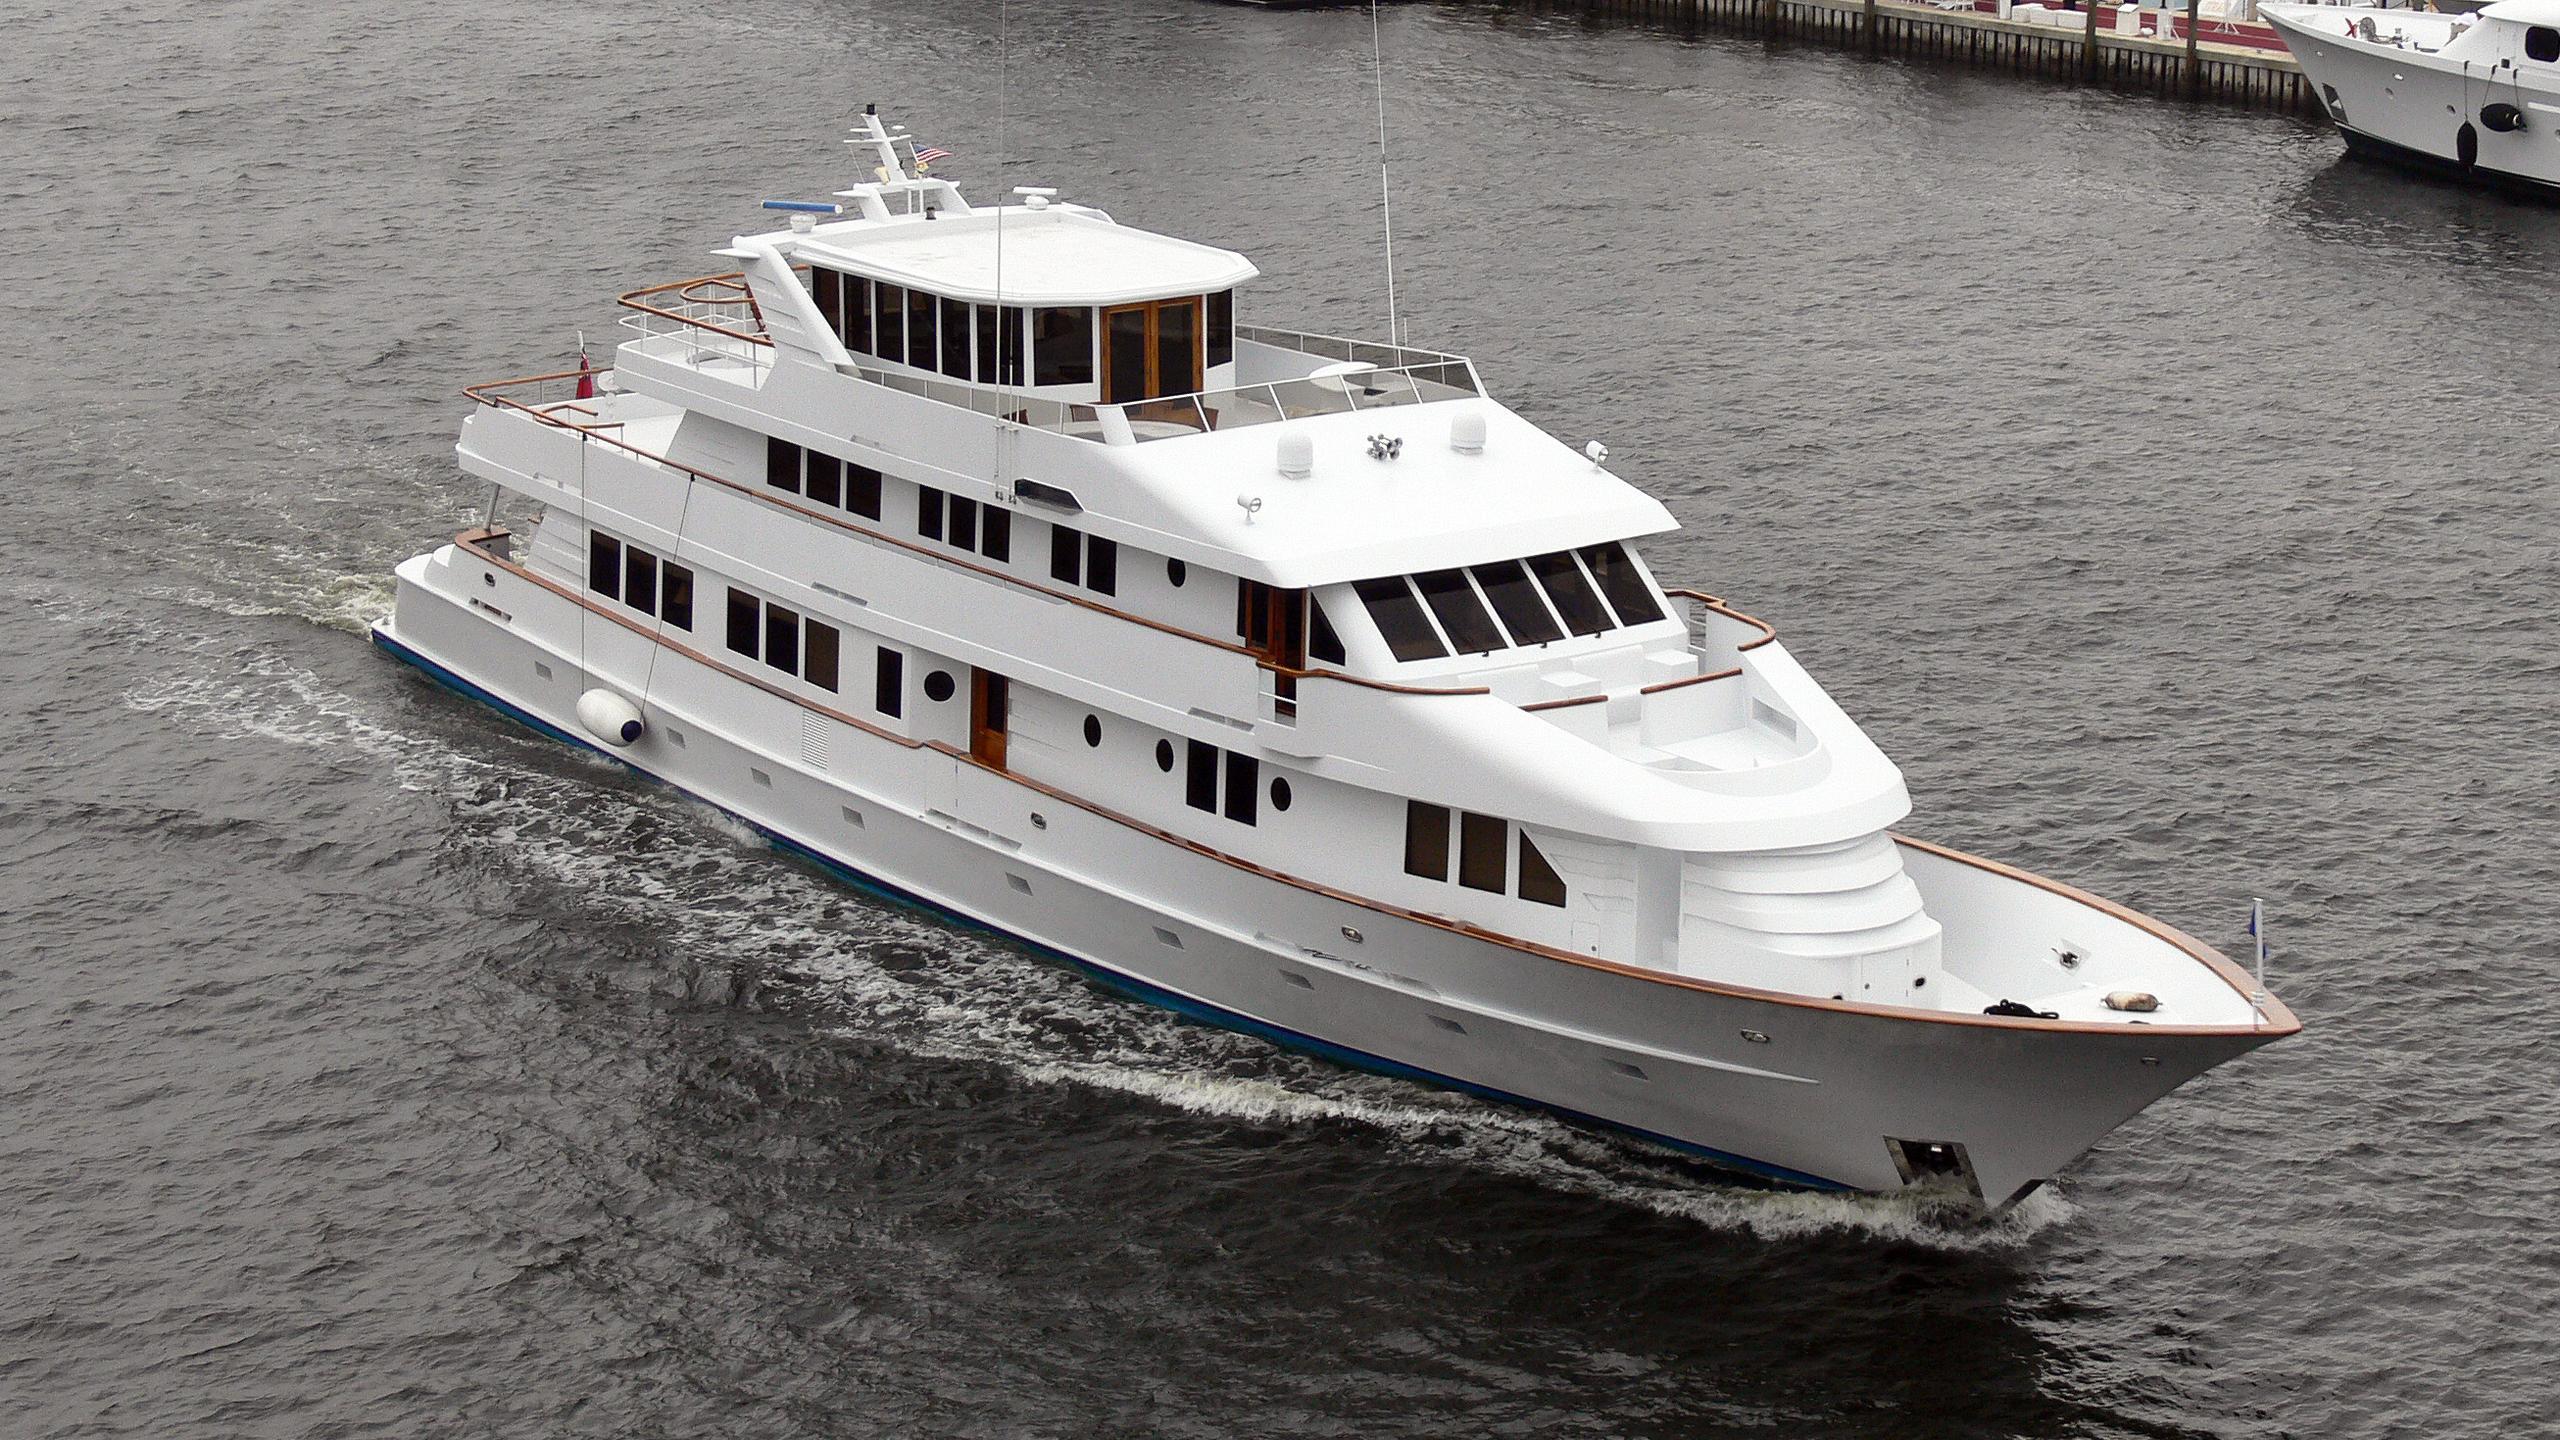 mehzam-motor-yacht-st-james-1996-43m-cruising